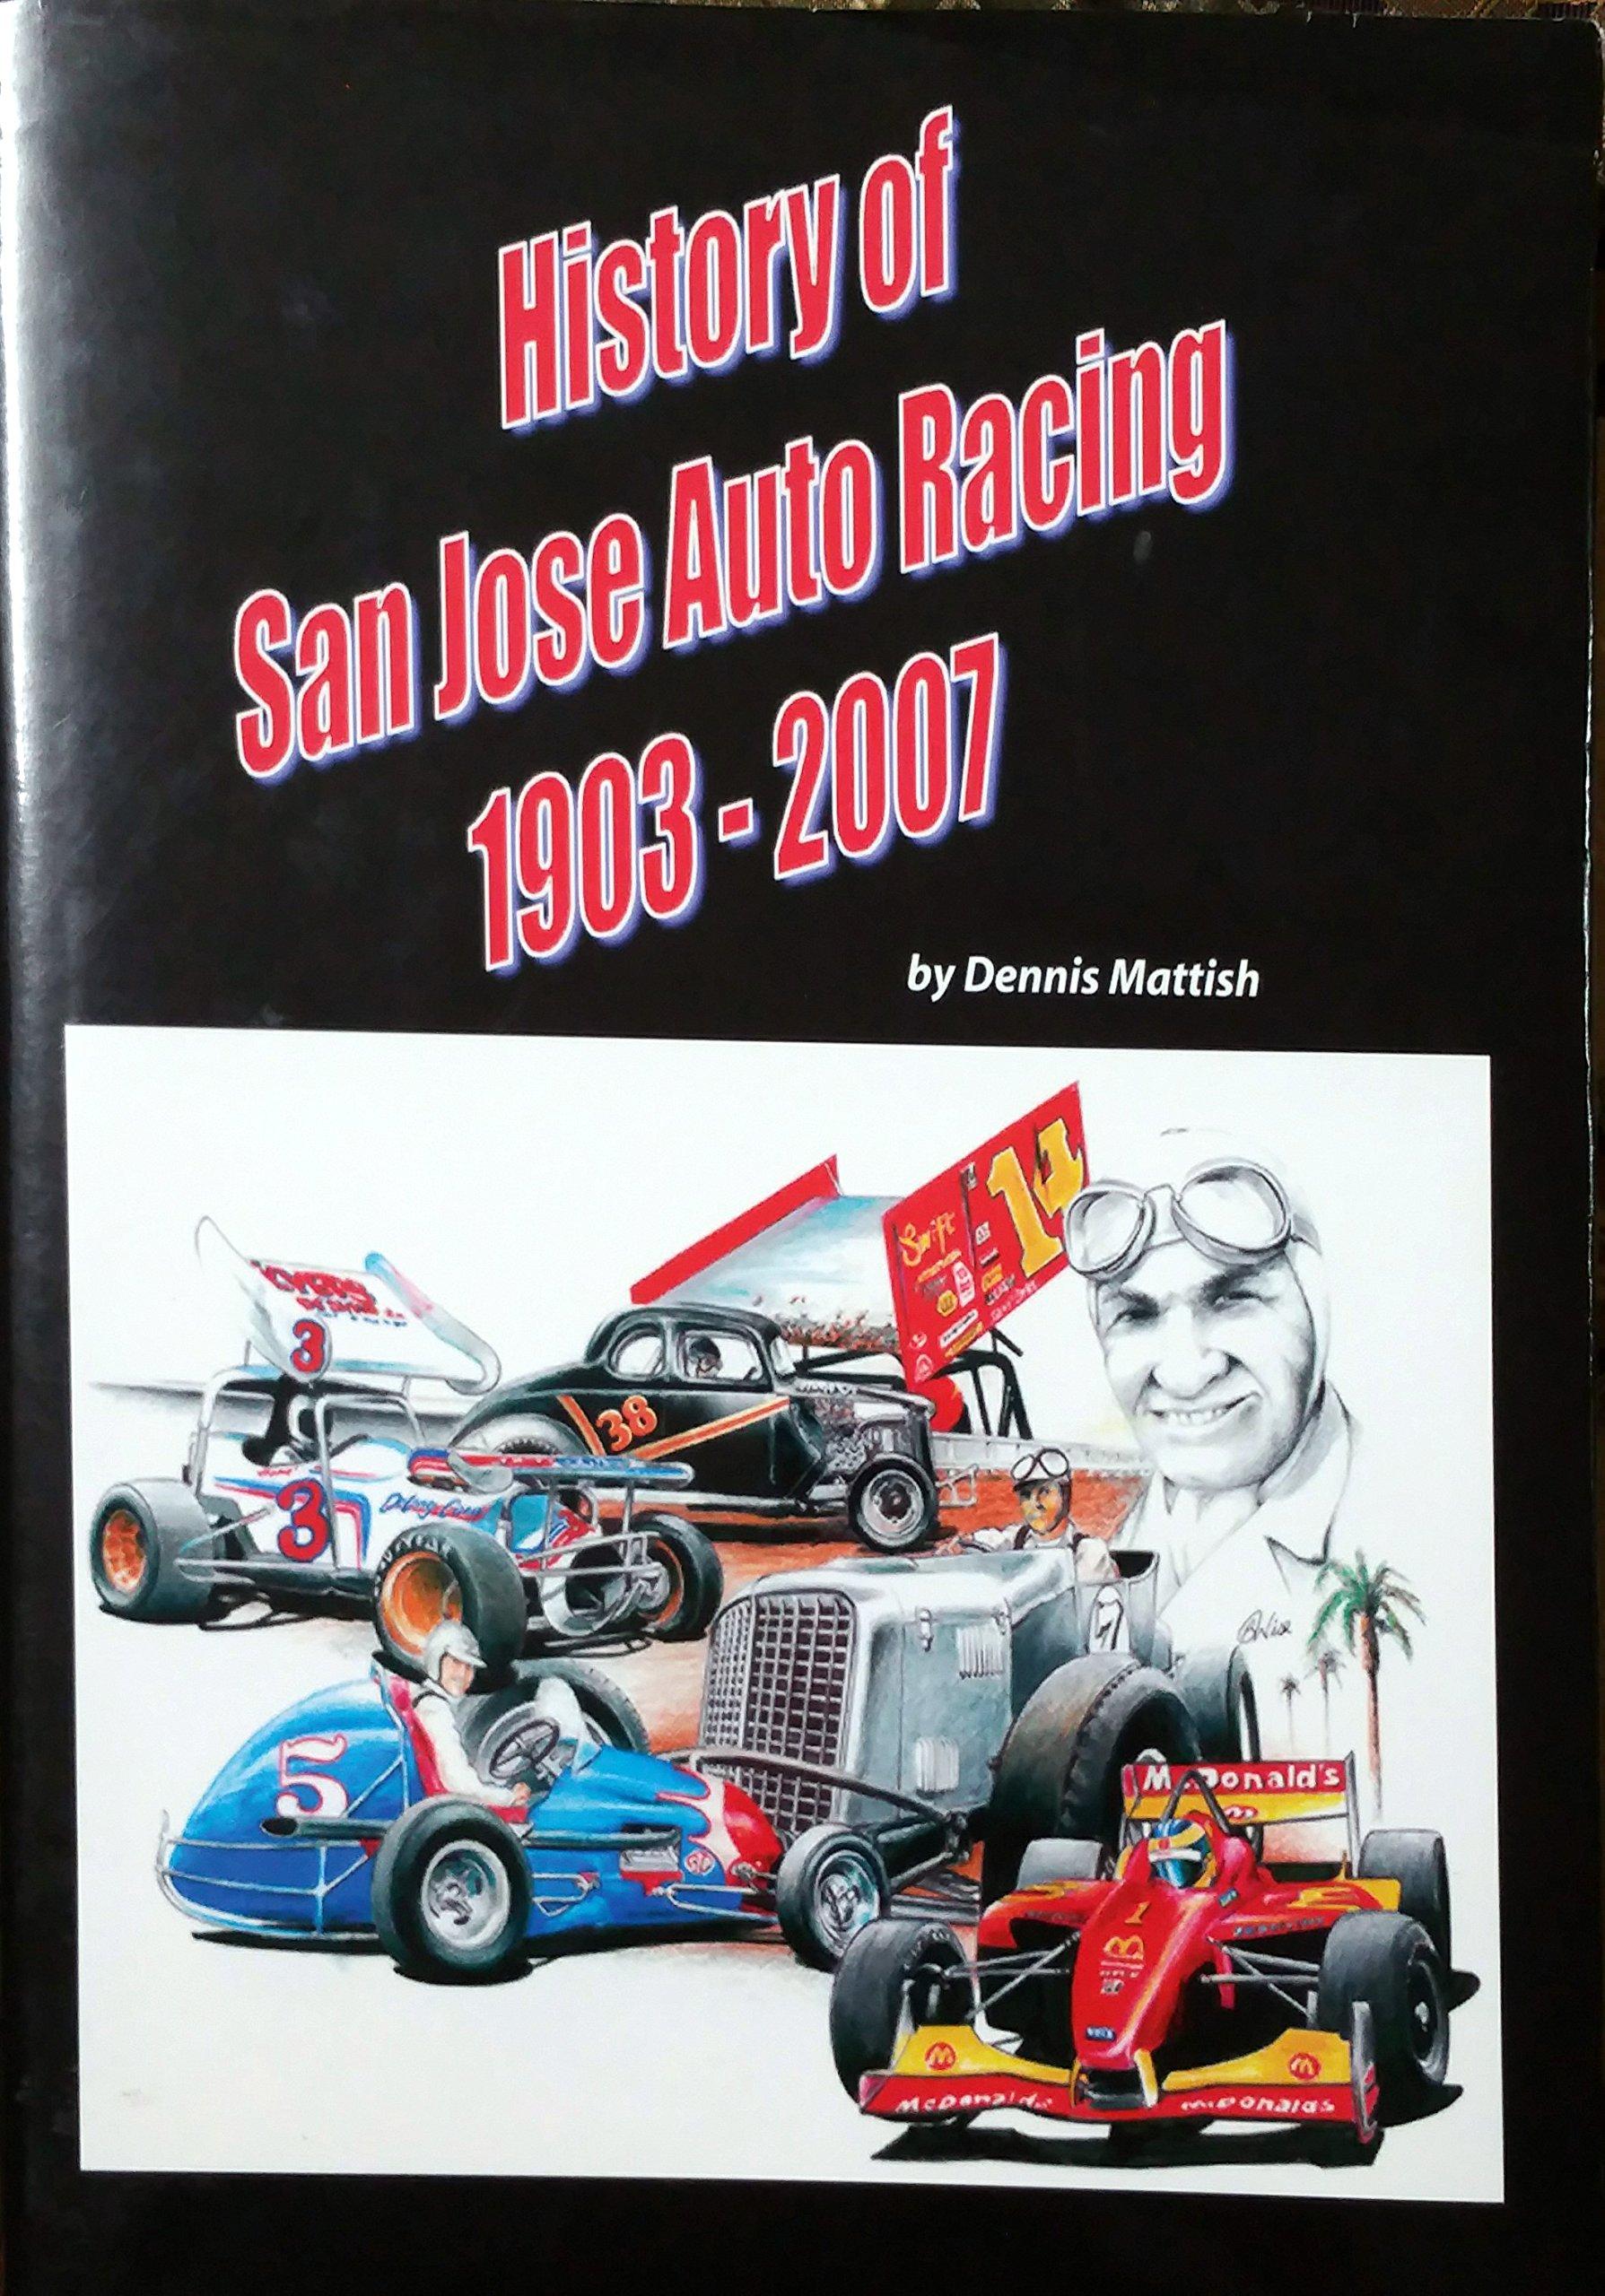 Download History of San Jose Auto Racing, 1903-2007 ebook